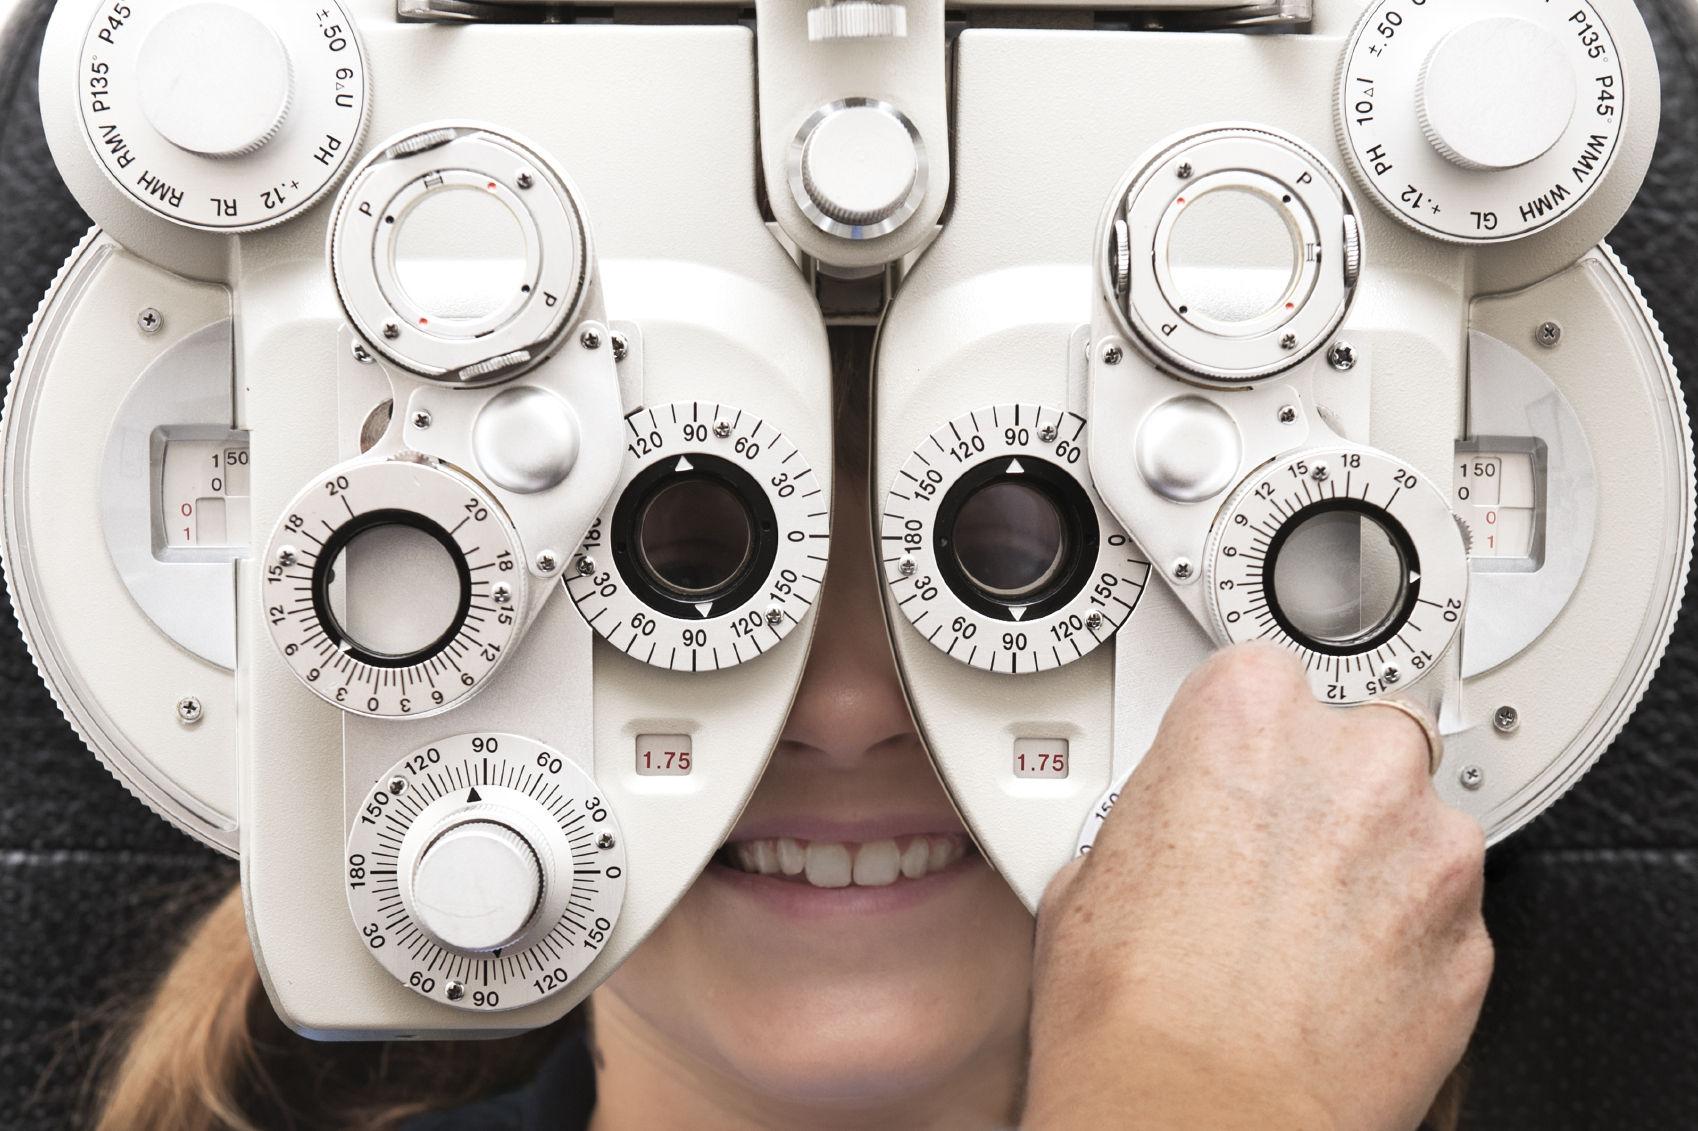 Kontakt Lens Nedir